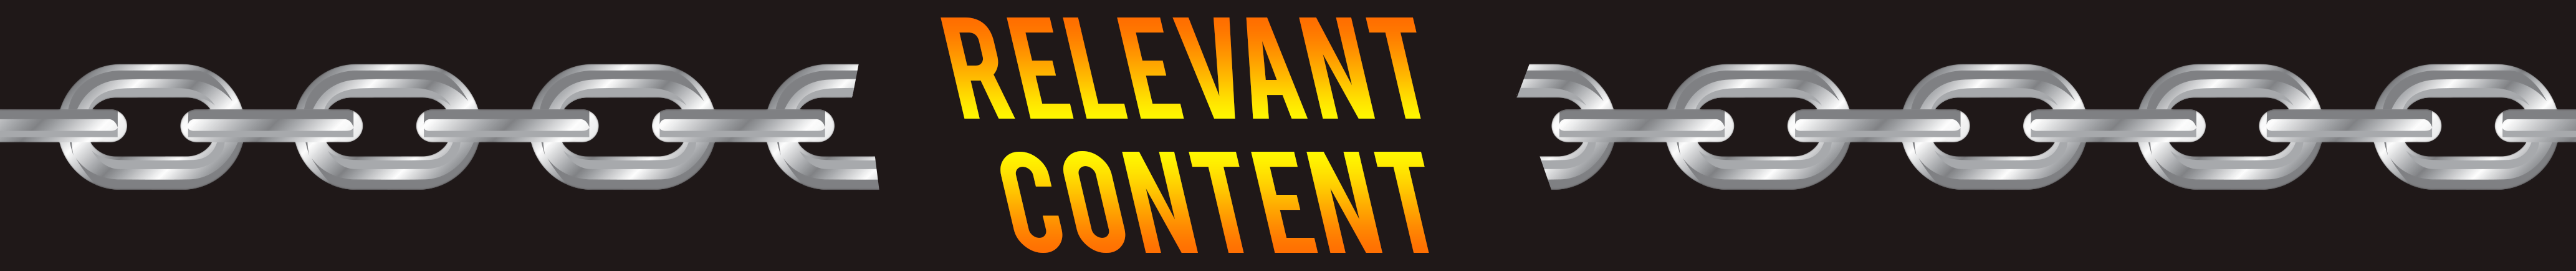 relevant content